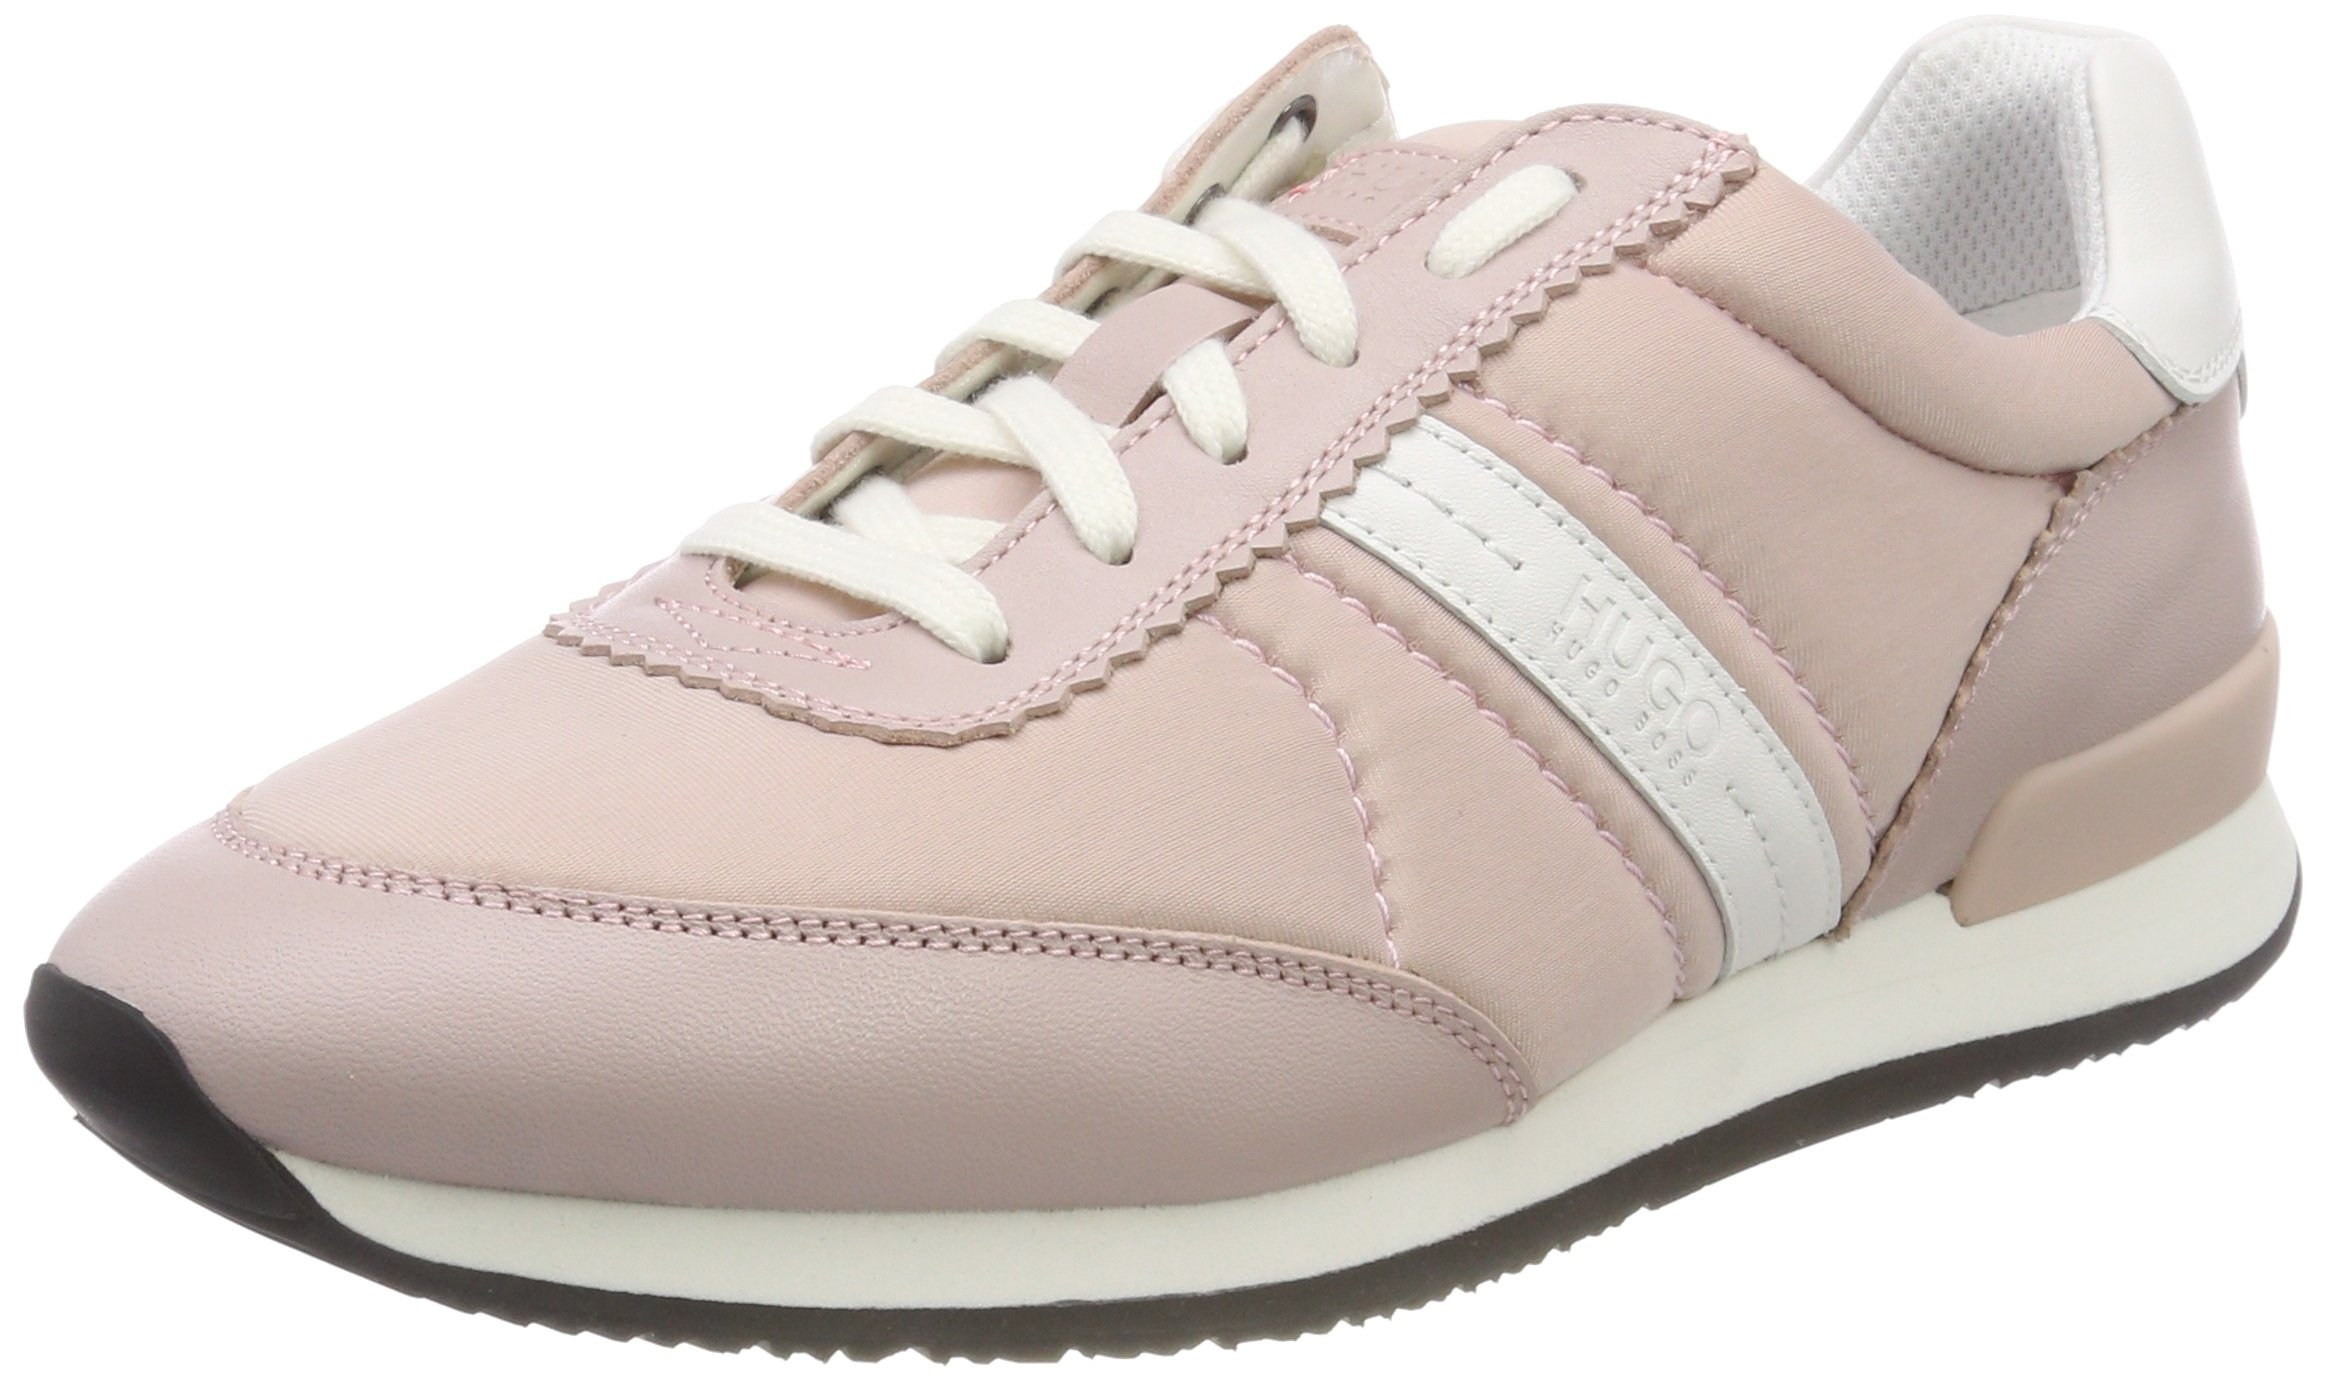 FemmeRoselight Harlem Eu nSneakers Hugo Adrienne Basses Pink 68140 pastel QshCxBtrd